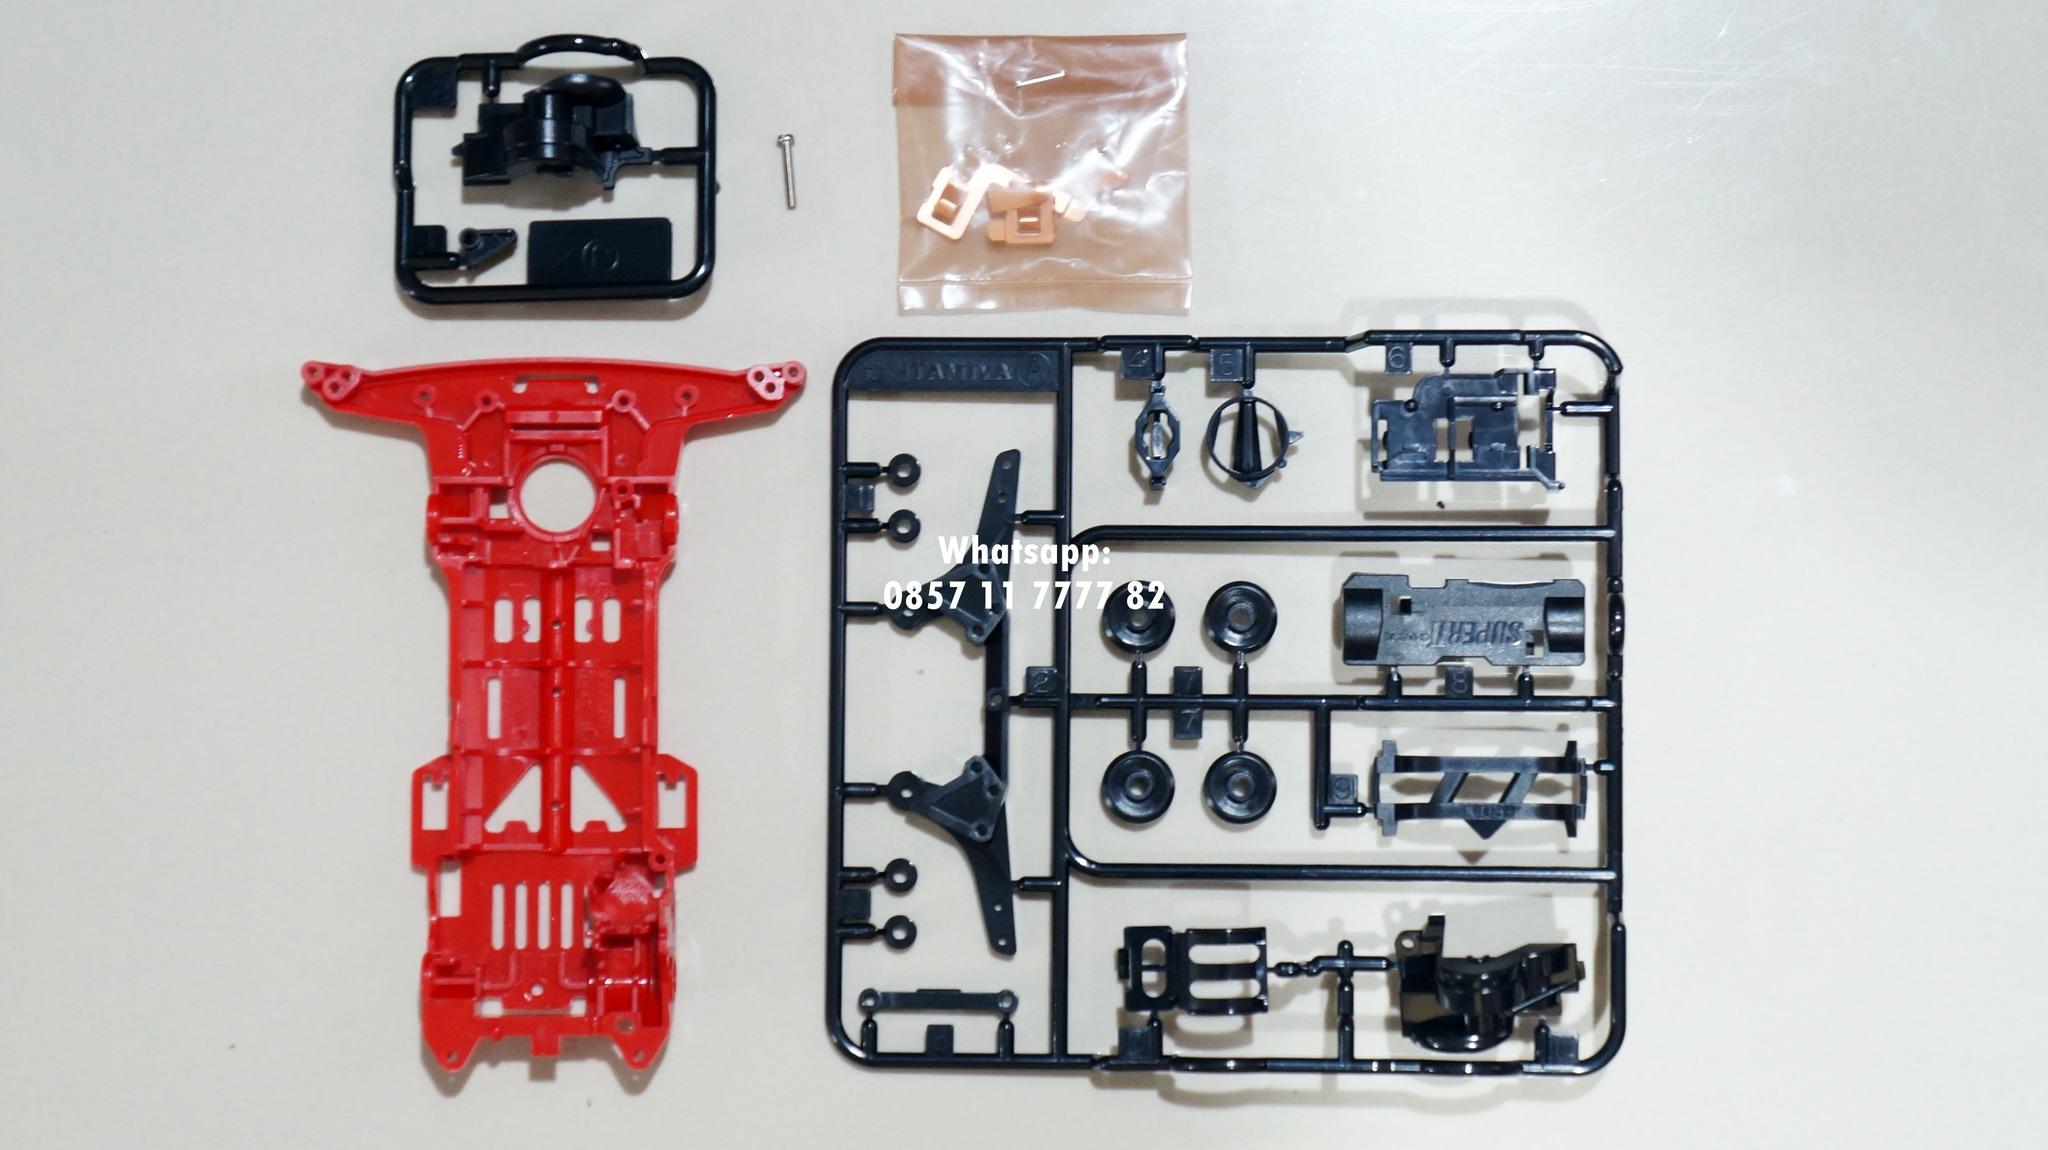 Jual Tamiya Loose Part Chassis Super Ii Red W Gearboxterminal Original Gearboxterminaleasy Lock Gudang Tv Tokopedia